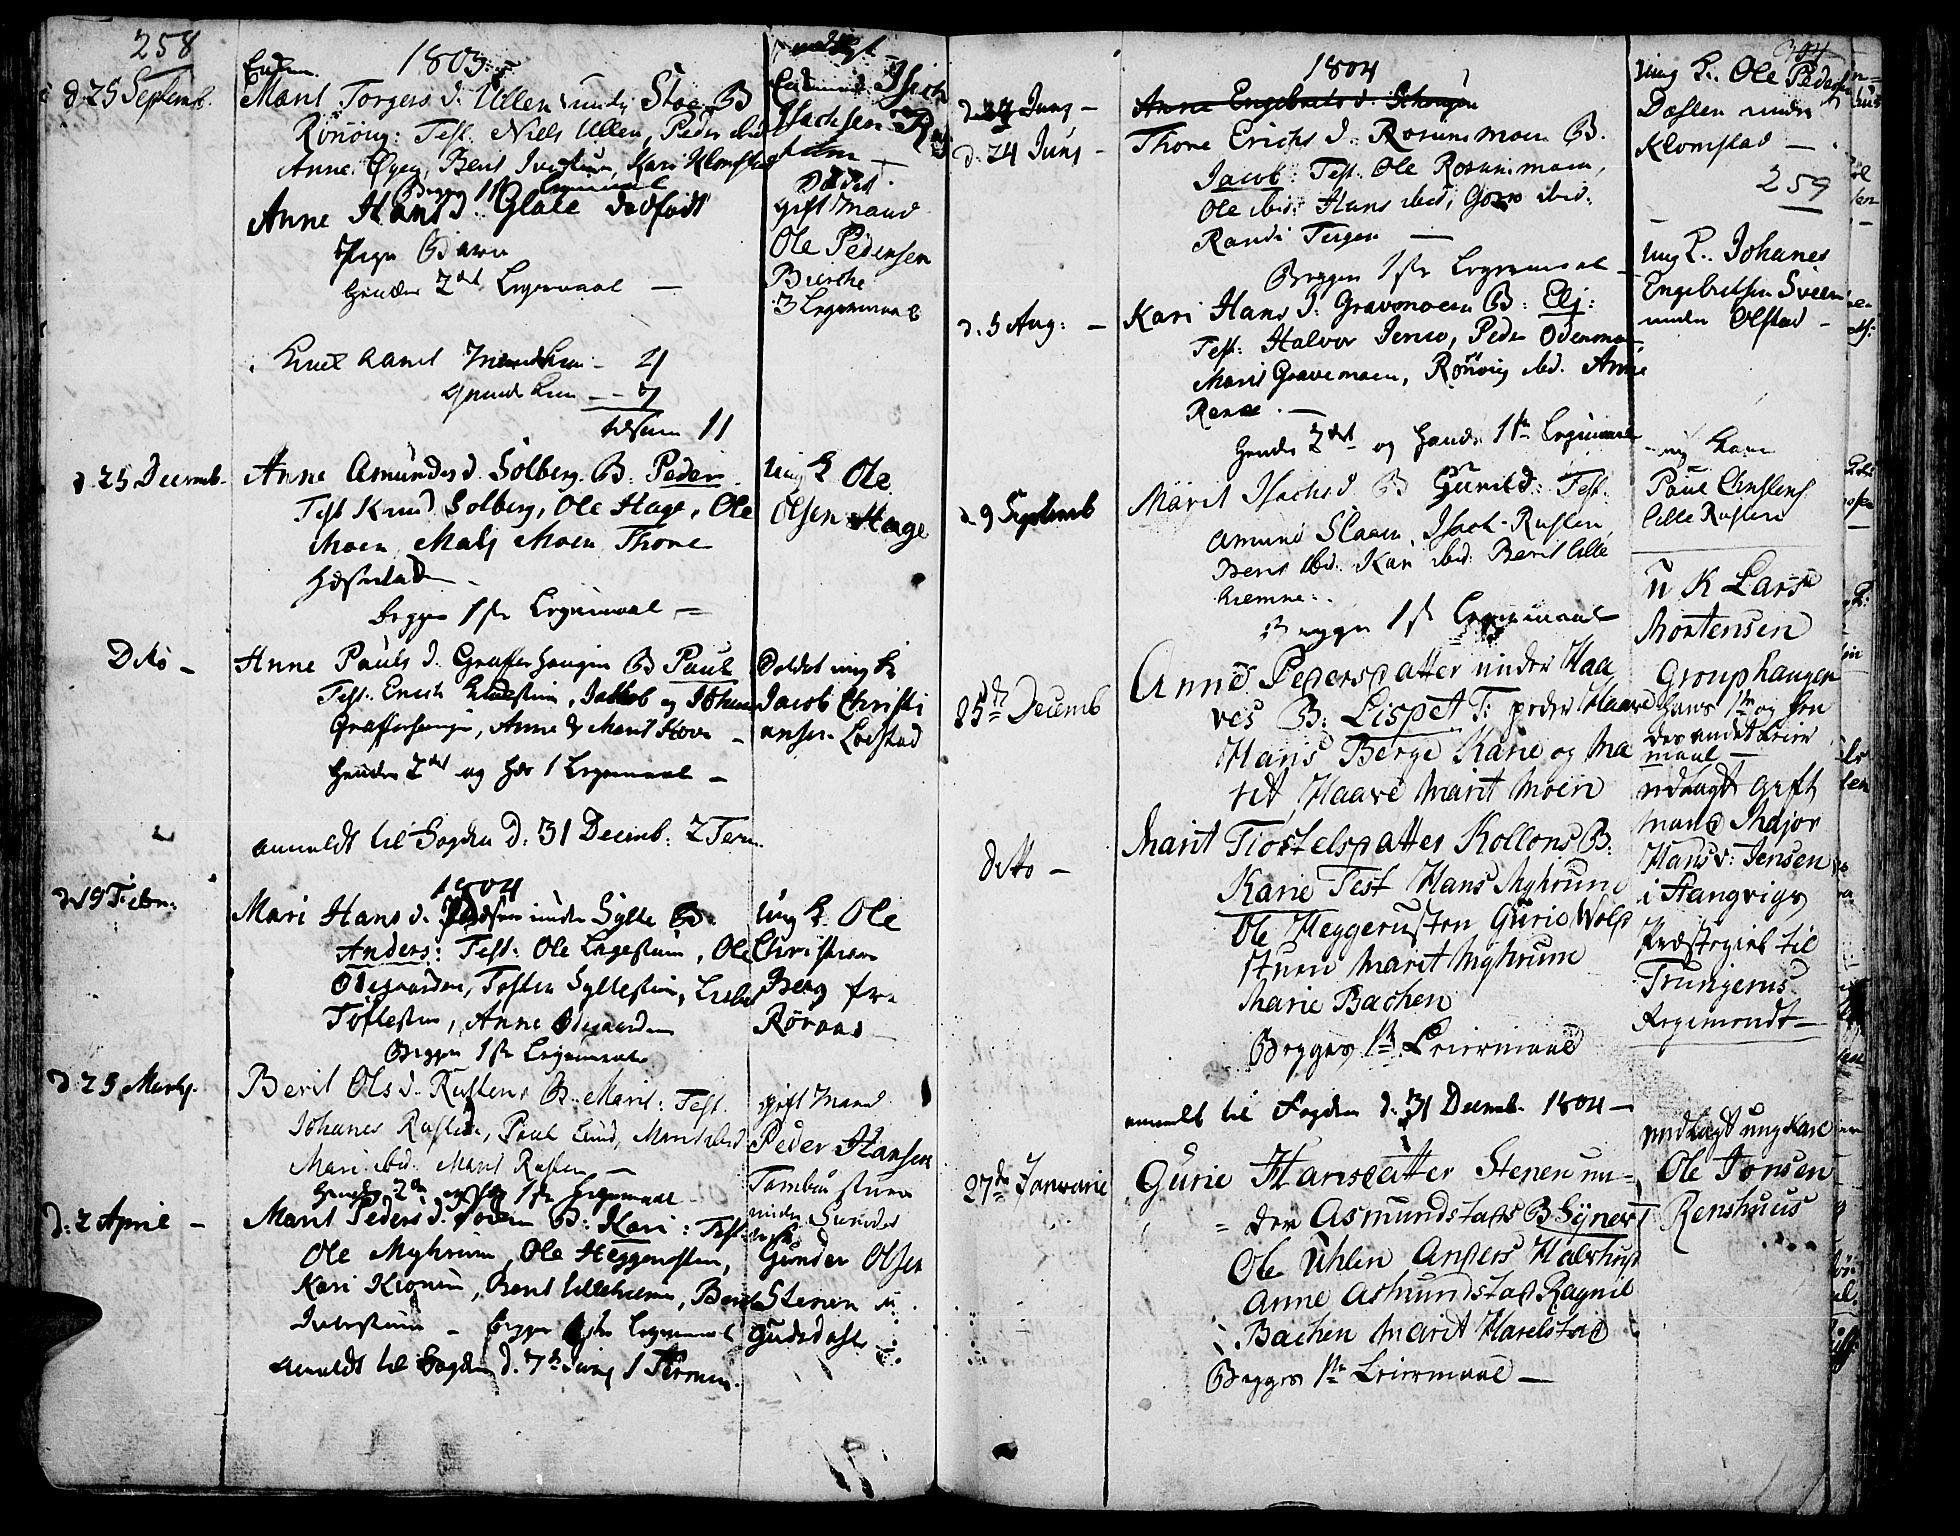 SAH, Fron prestekontor, H/Ha/Haa/L0001: Ministerialbok nr. 1, 1799-1816, s. 258-259